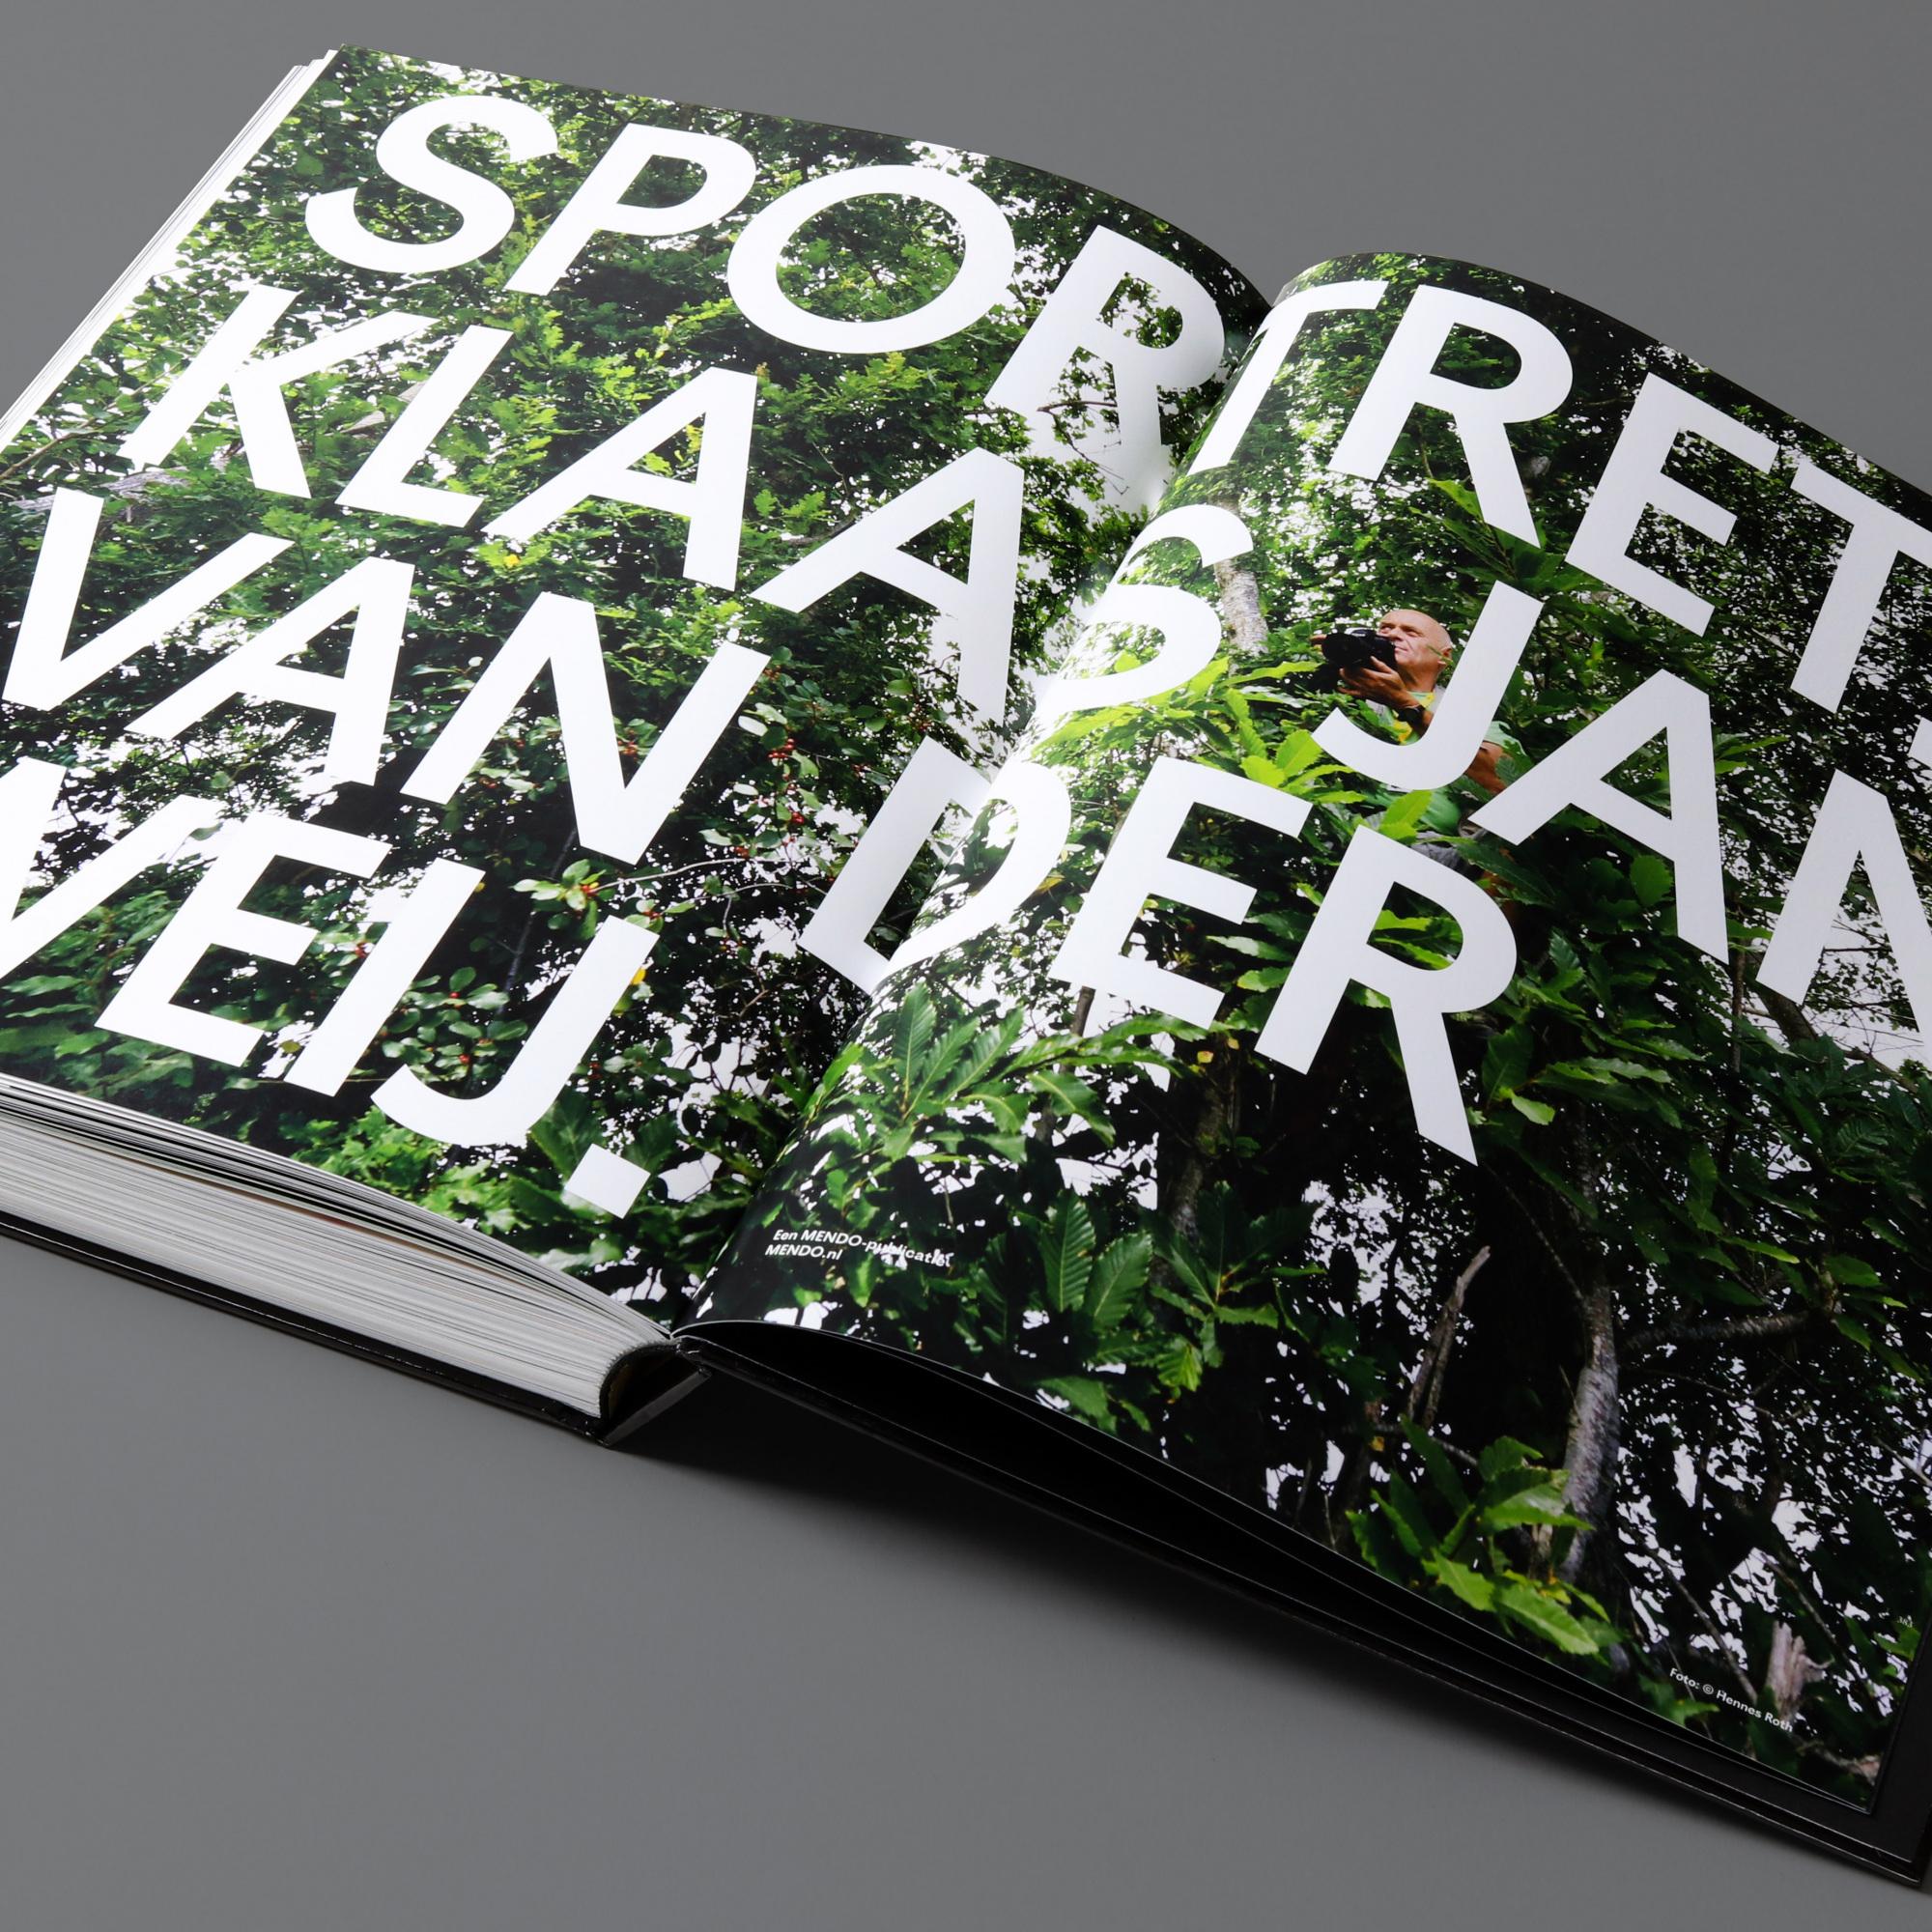 mendo-books-Sportret-studio-01-18-van-18-2000x2000-c-default.jpg